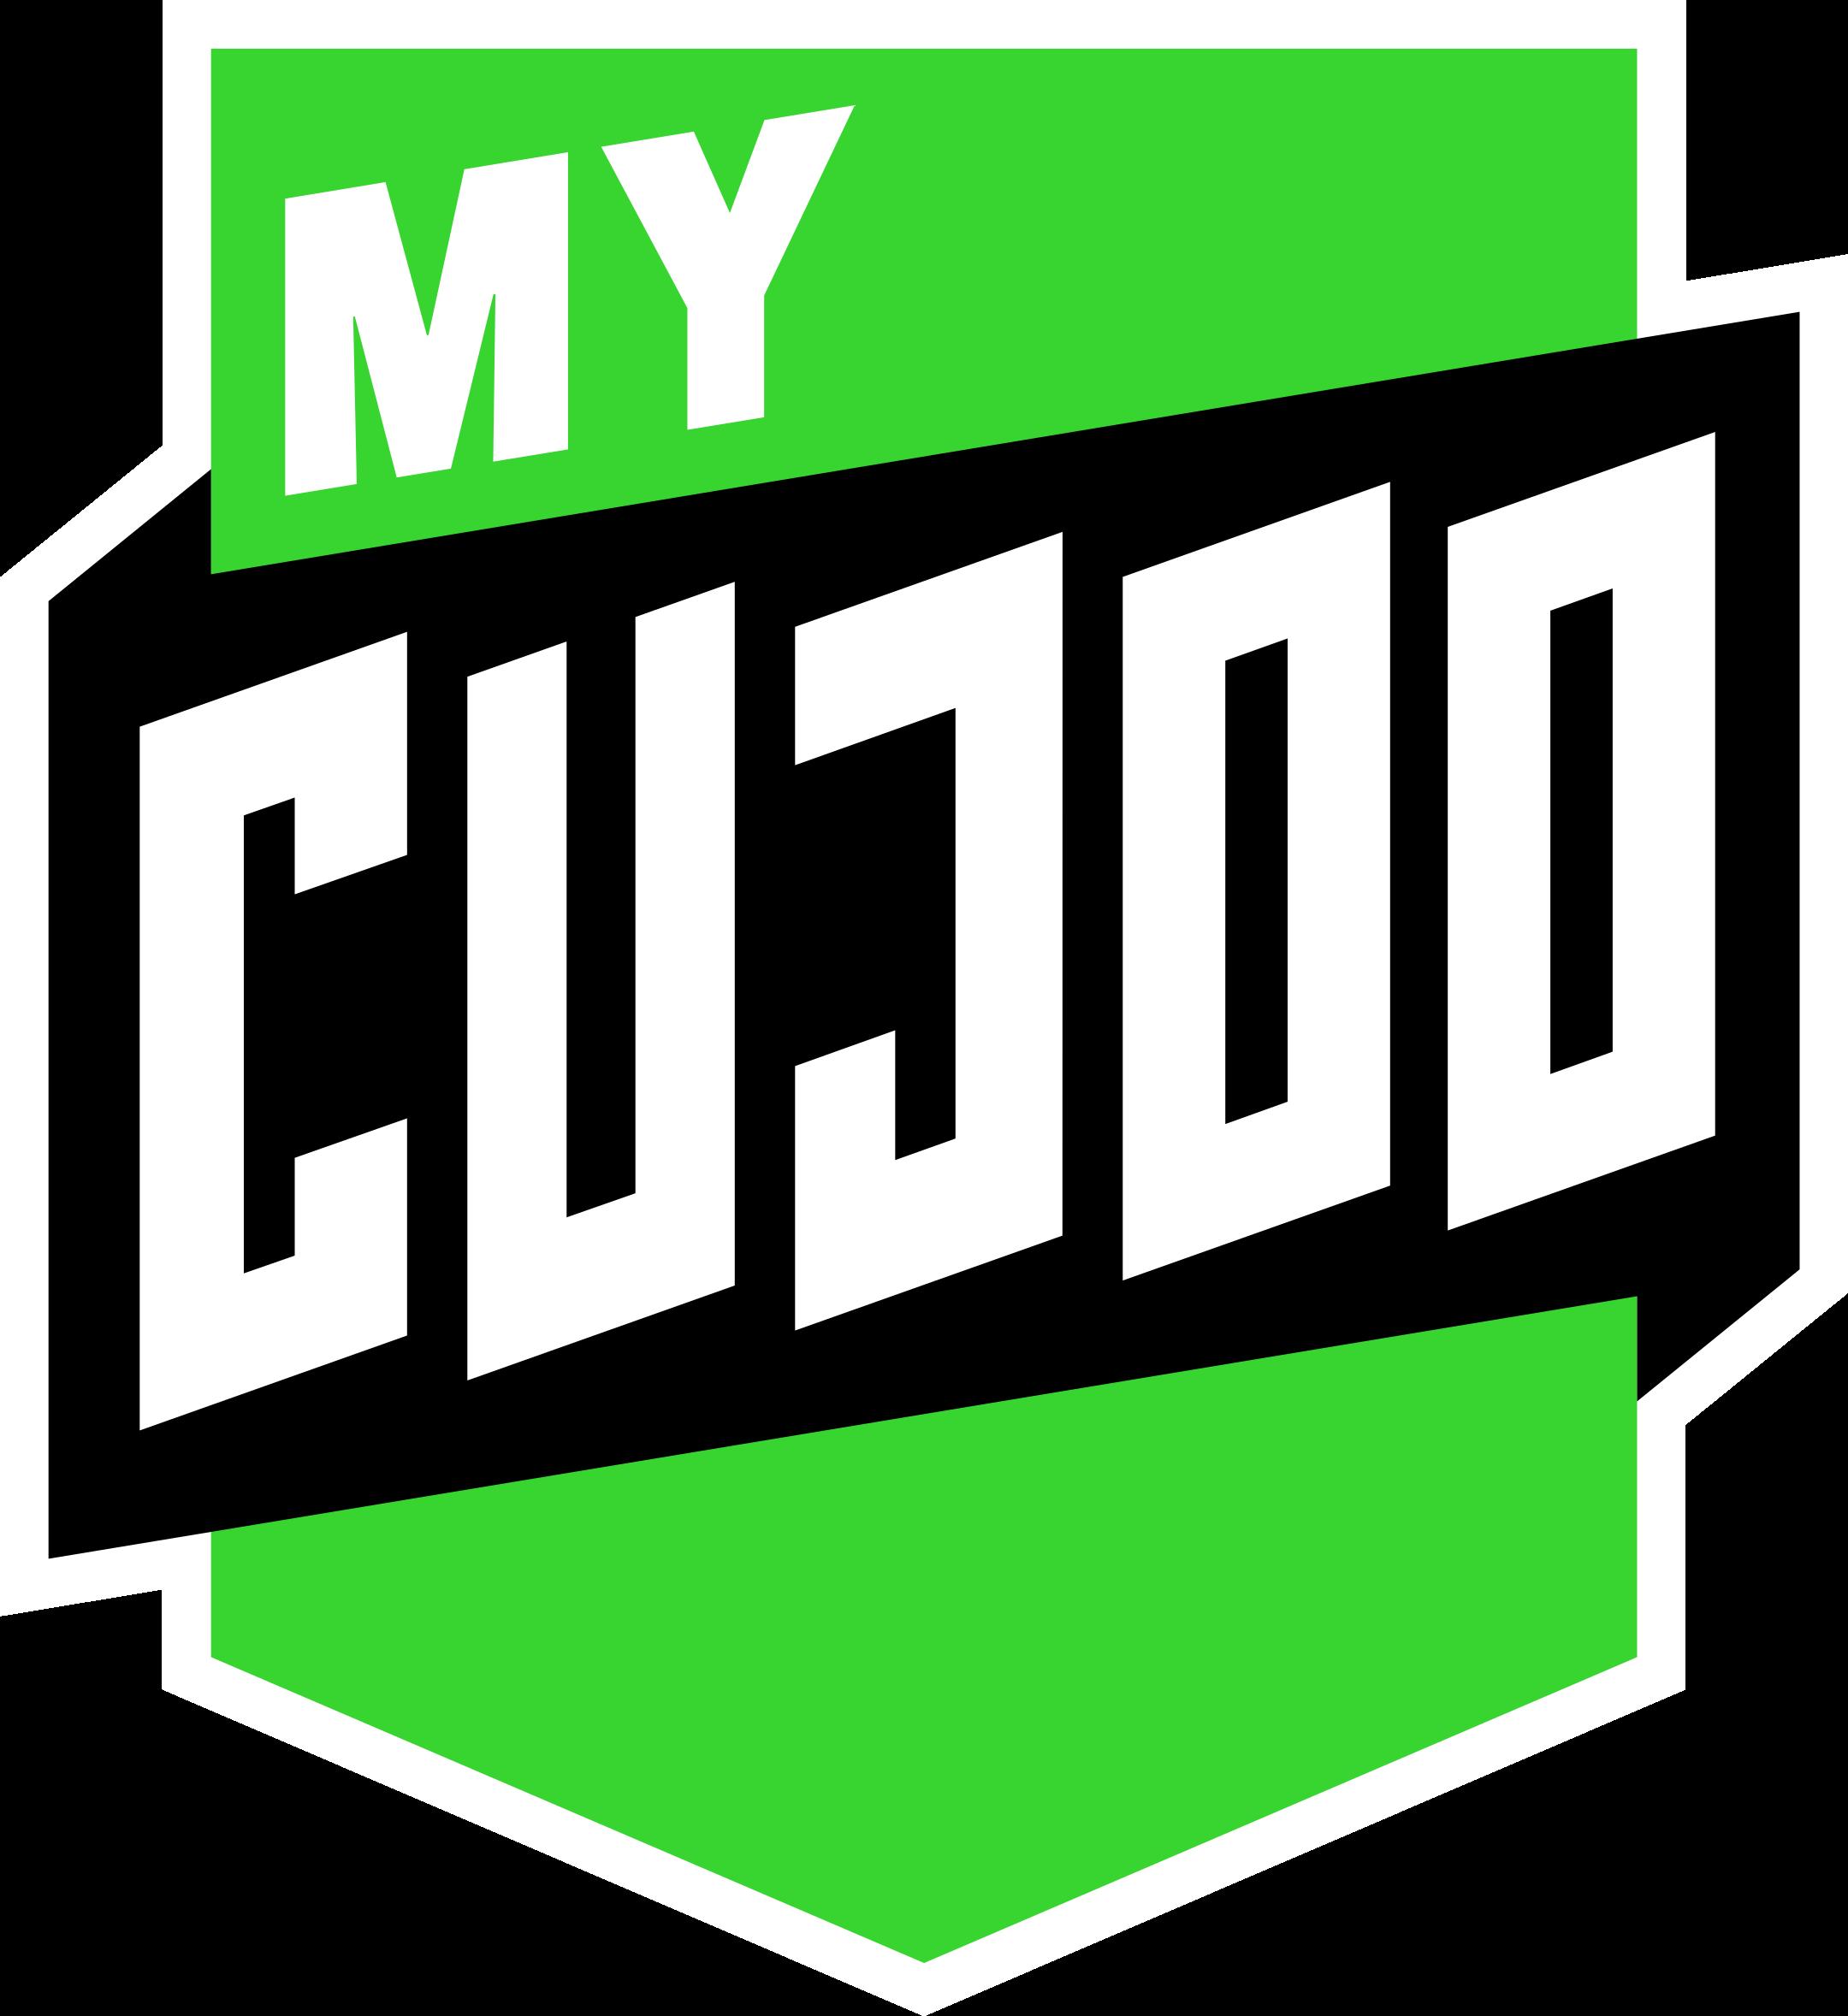 my cujoo logo 1 - My Cujoo Logo